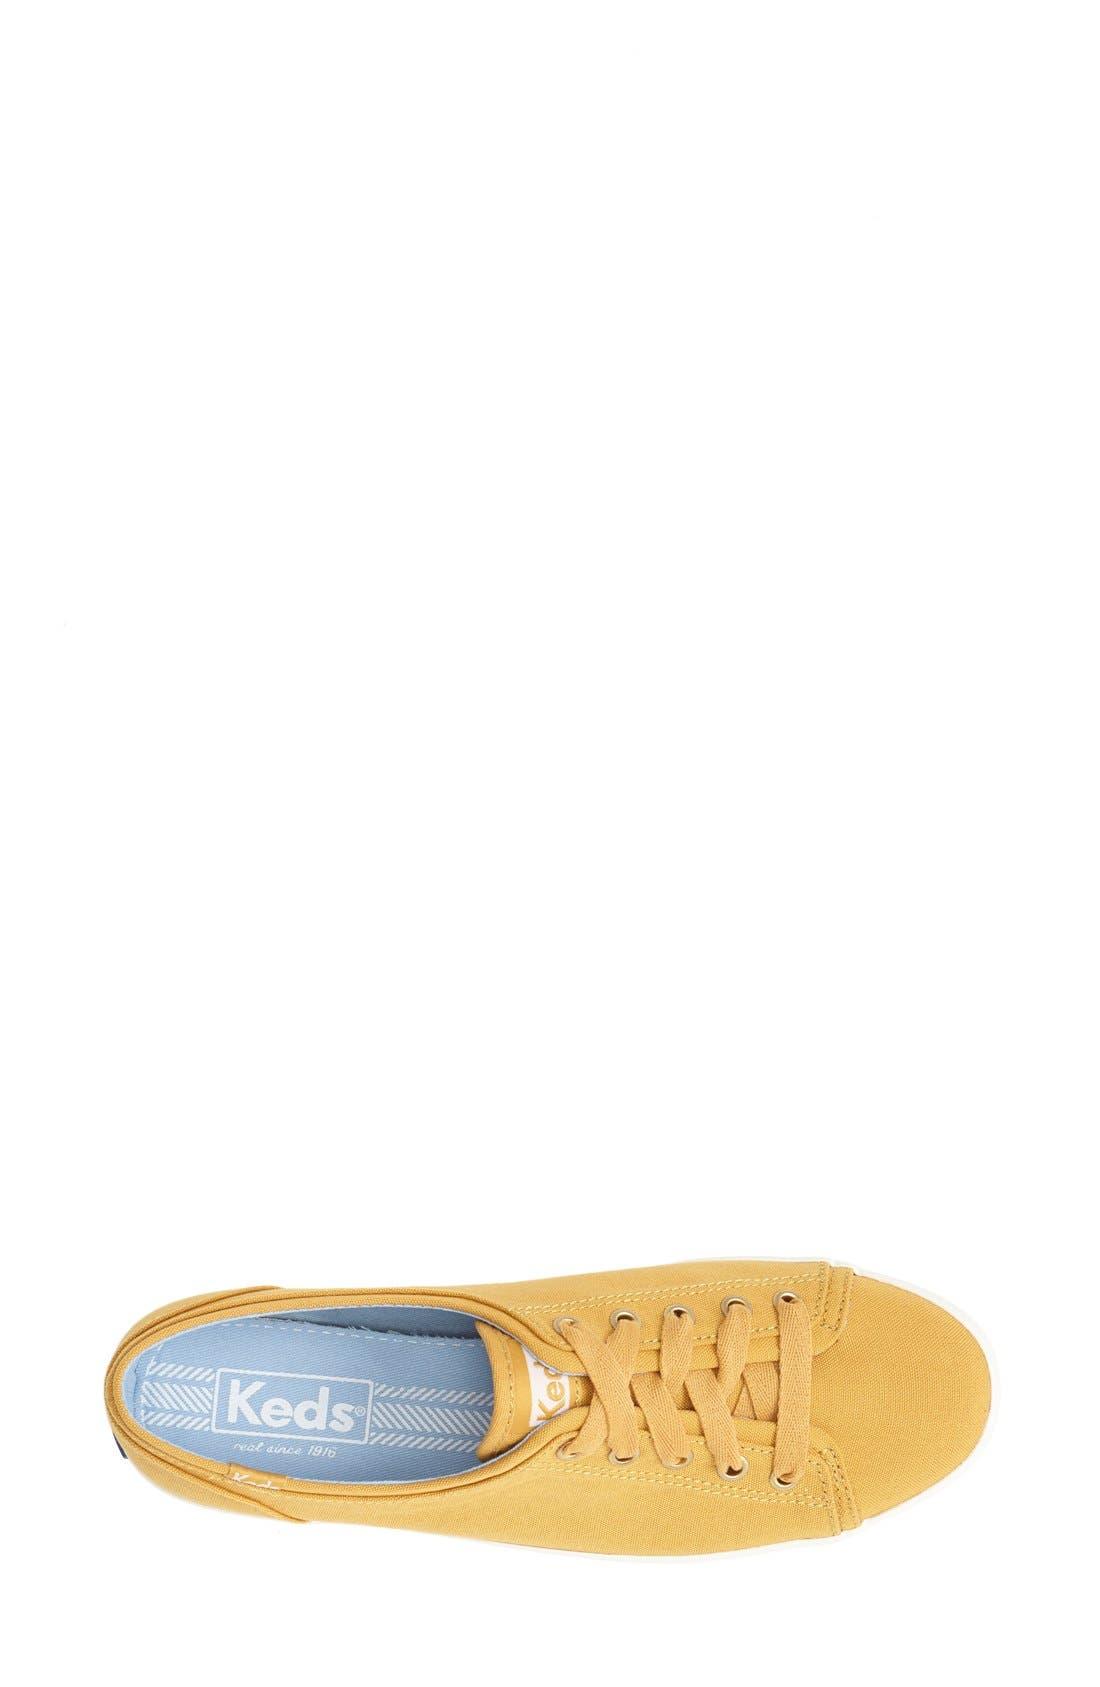 Alternate Image 3  - Keds® 'Rally' Sneaker (Women)